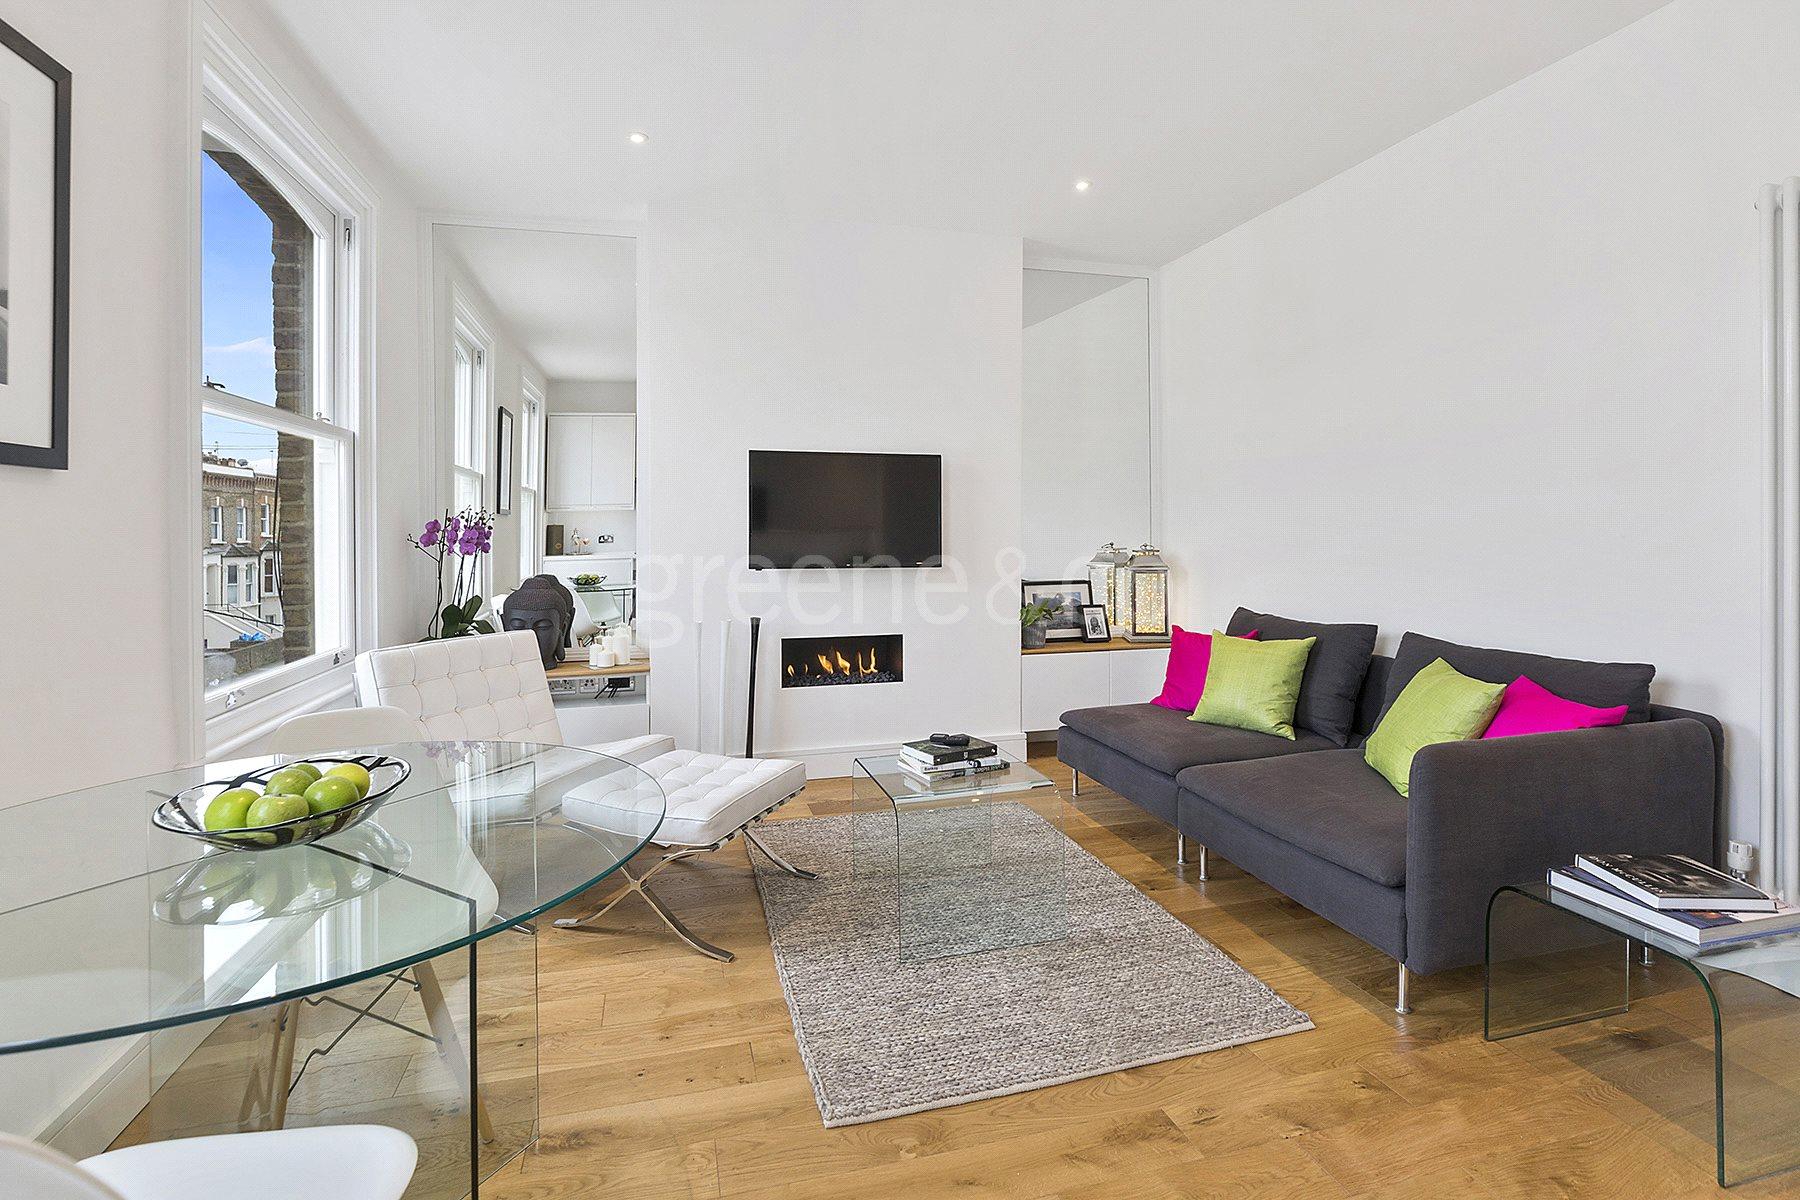 2 Bedrooms Flat for sale in Portnall Road, Maida Vale, London, W9